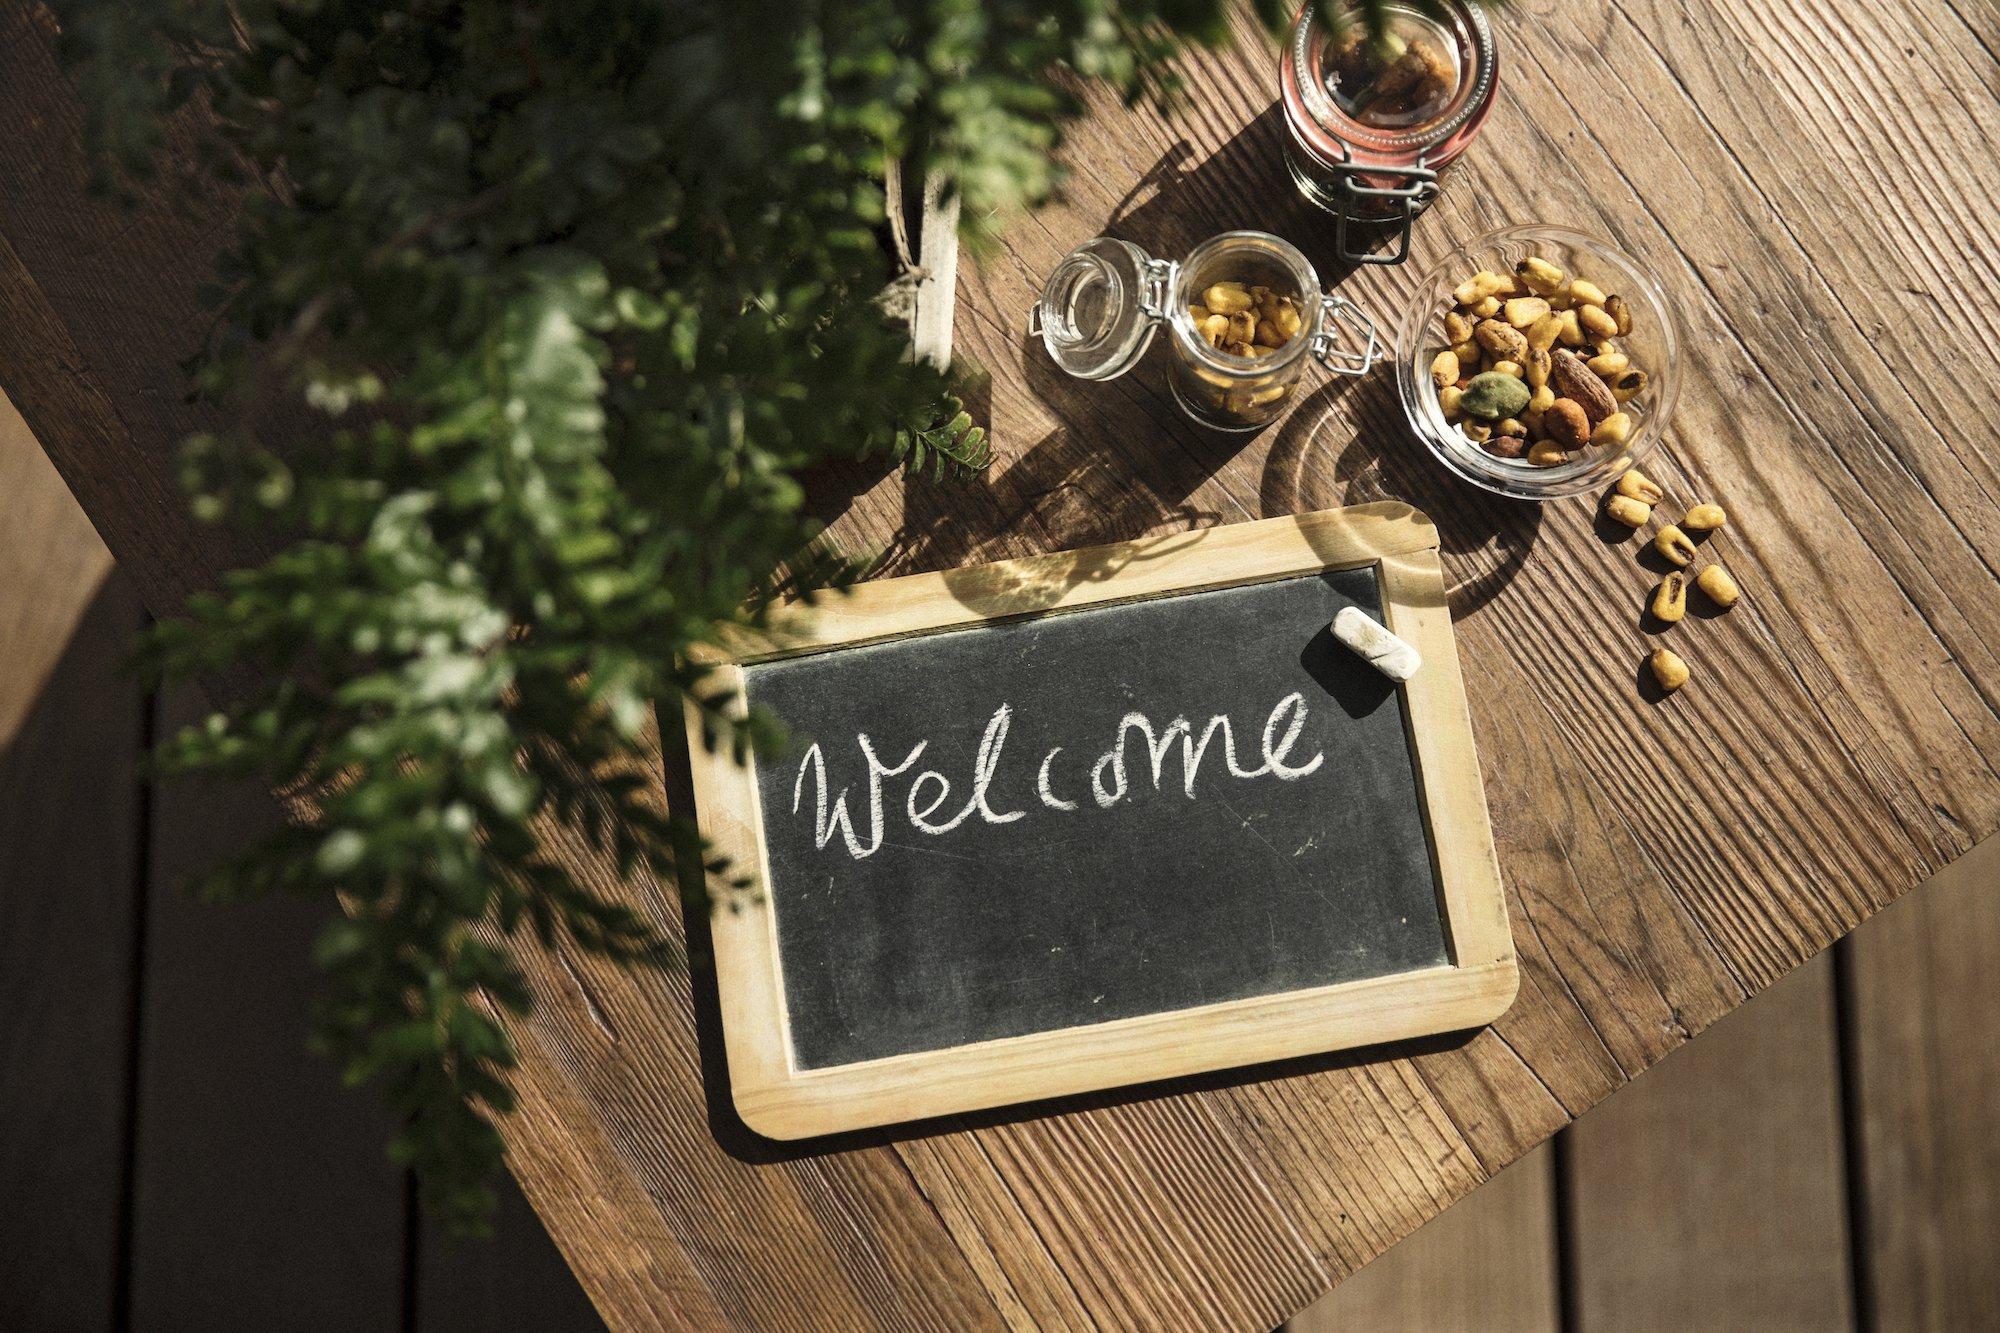 Welcome at the Valsana Hotel und Appartements in Arosa, Switzerland